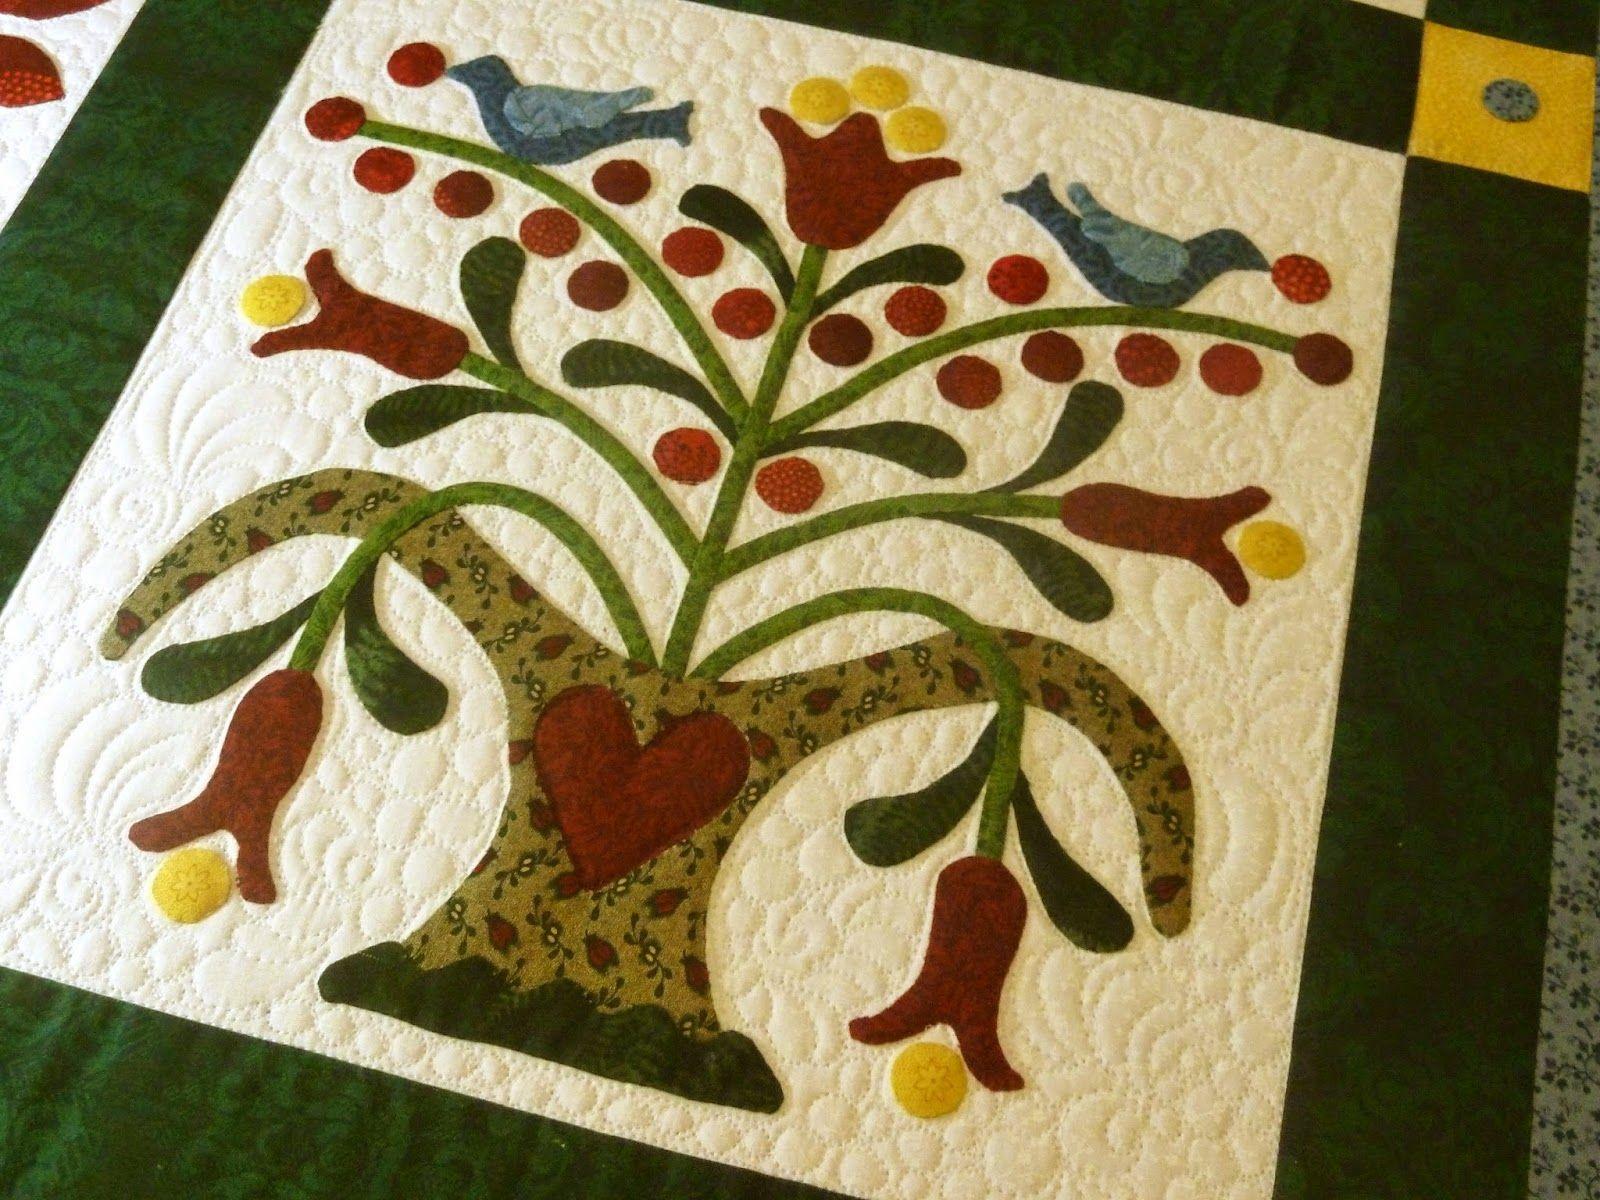 Sue Garman | DIY & Crafts | Pinterest | Quilt and Endless : sue garman quilt patterns - Adamdwight.com